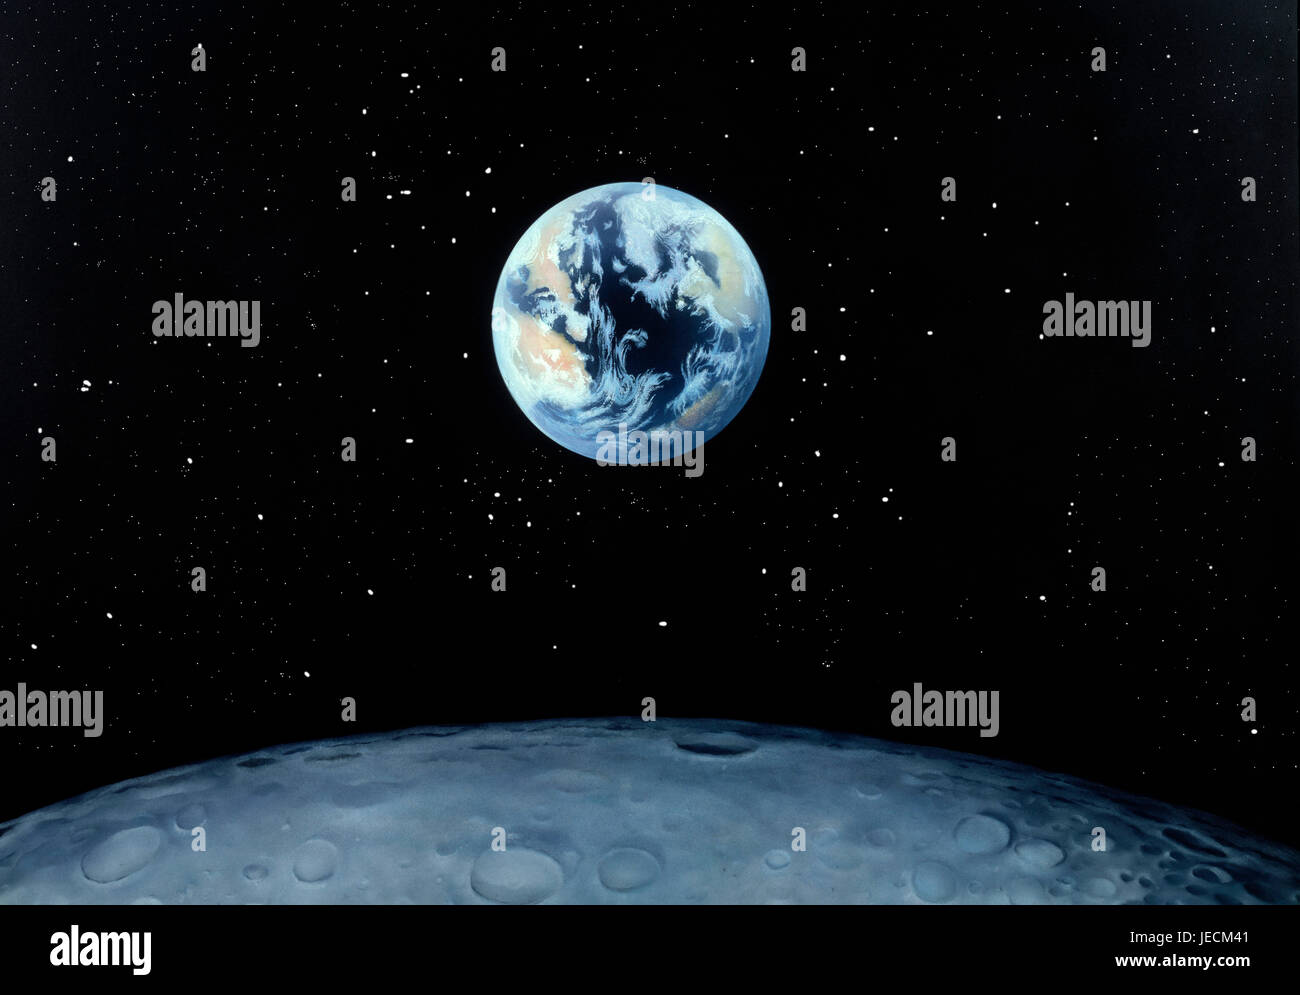 Artwork. Painting. Earth rising above moon's horizon. - Stock Image